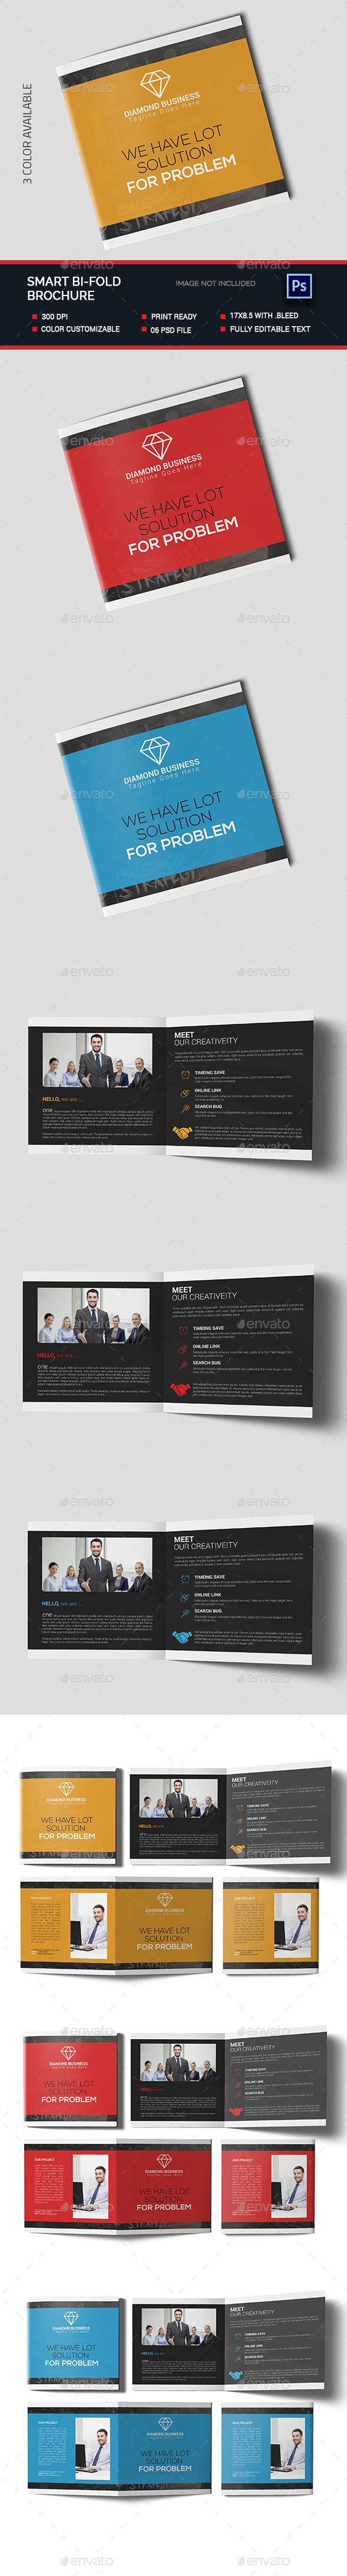 Smart Bi-fold Brochure - Brochures Print Templates